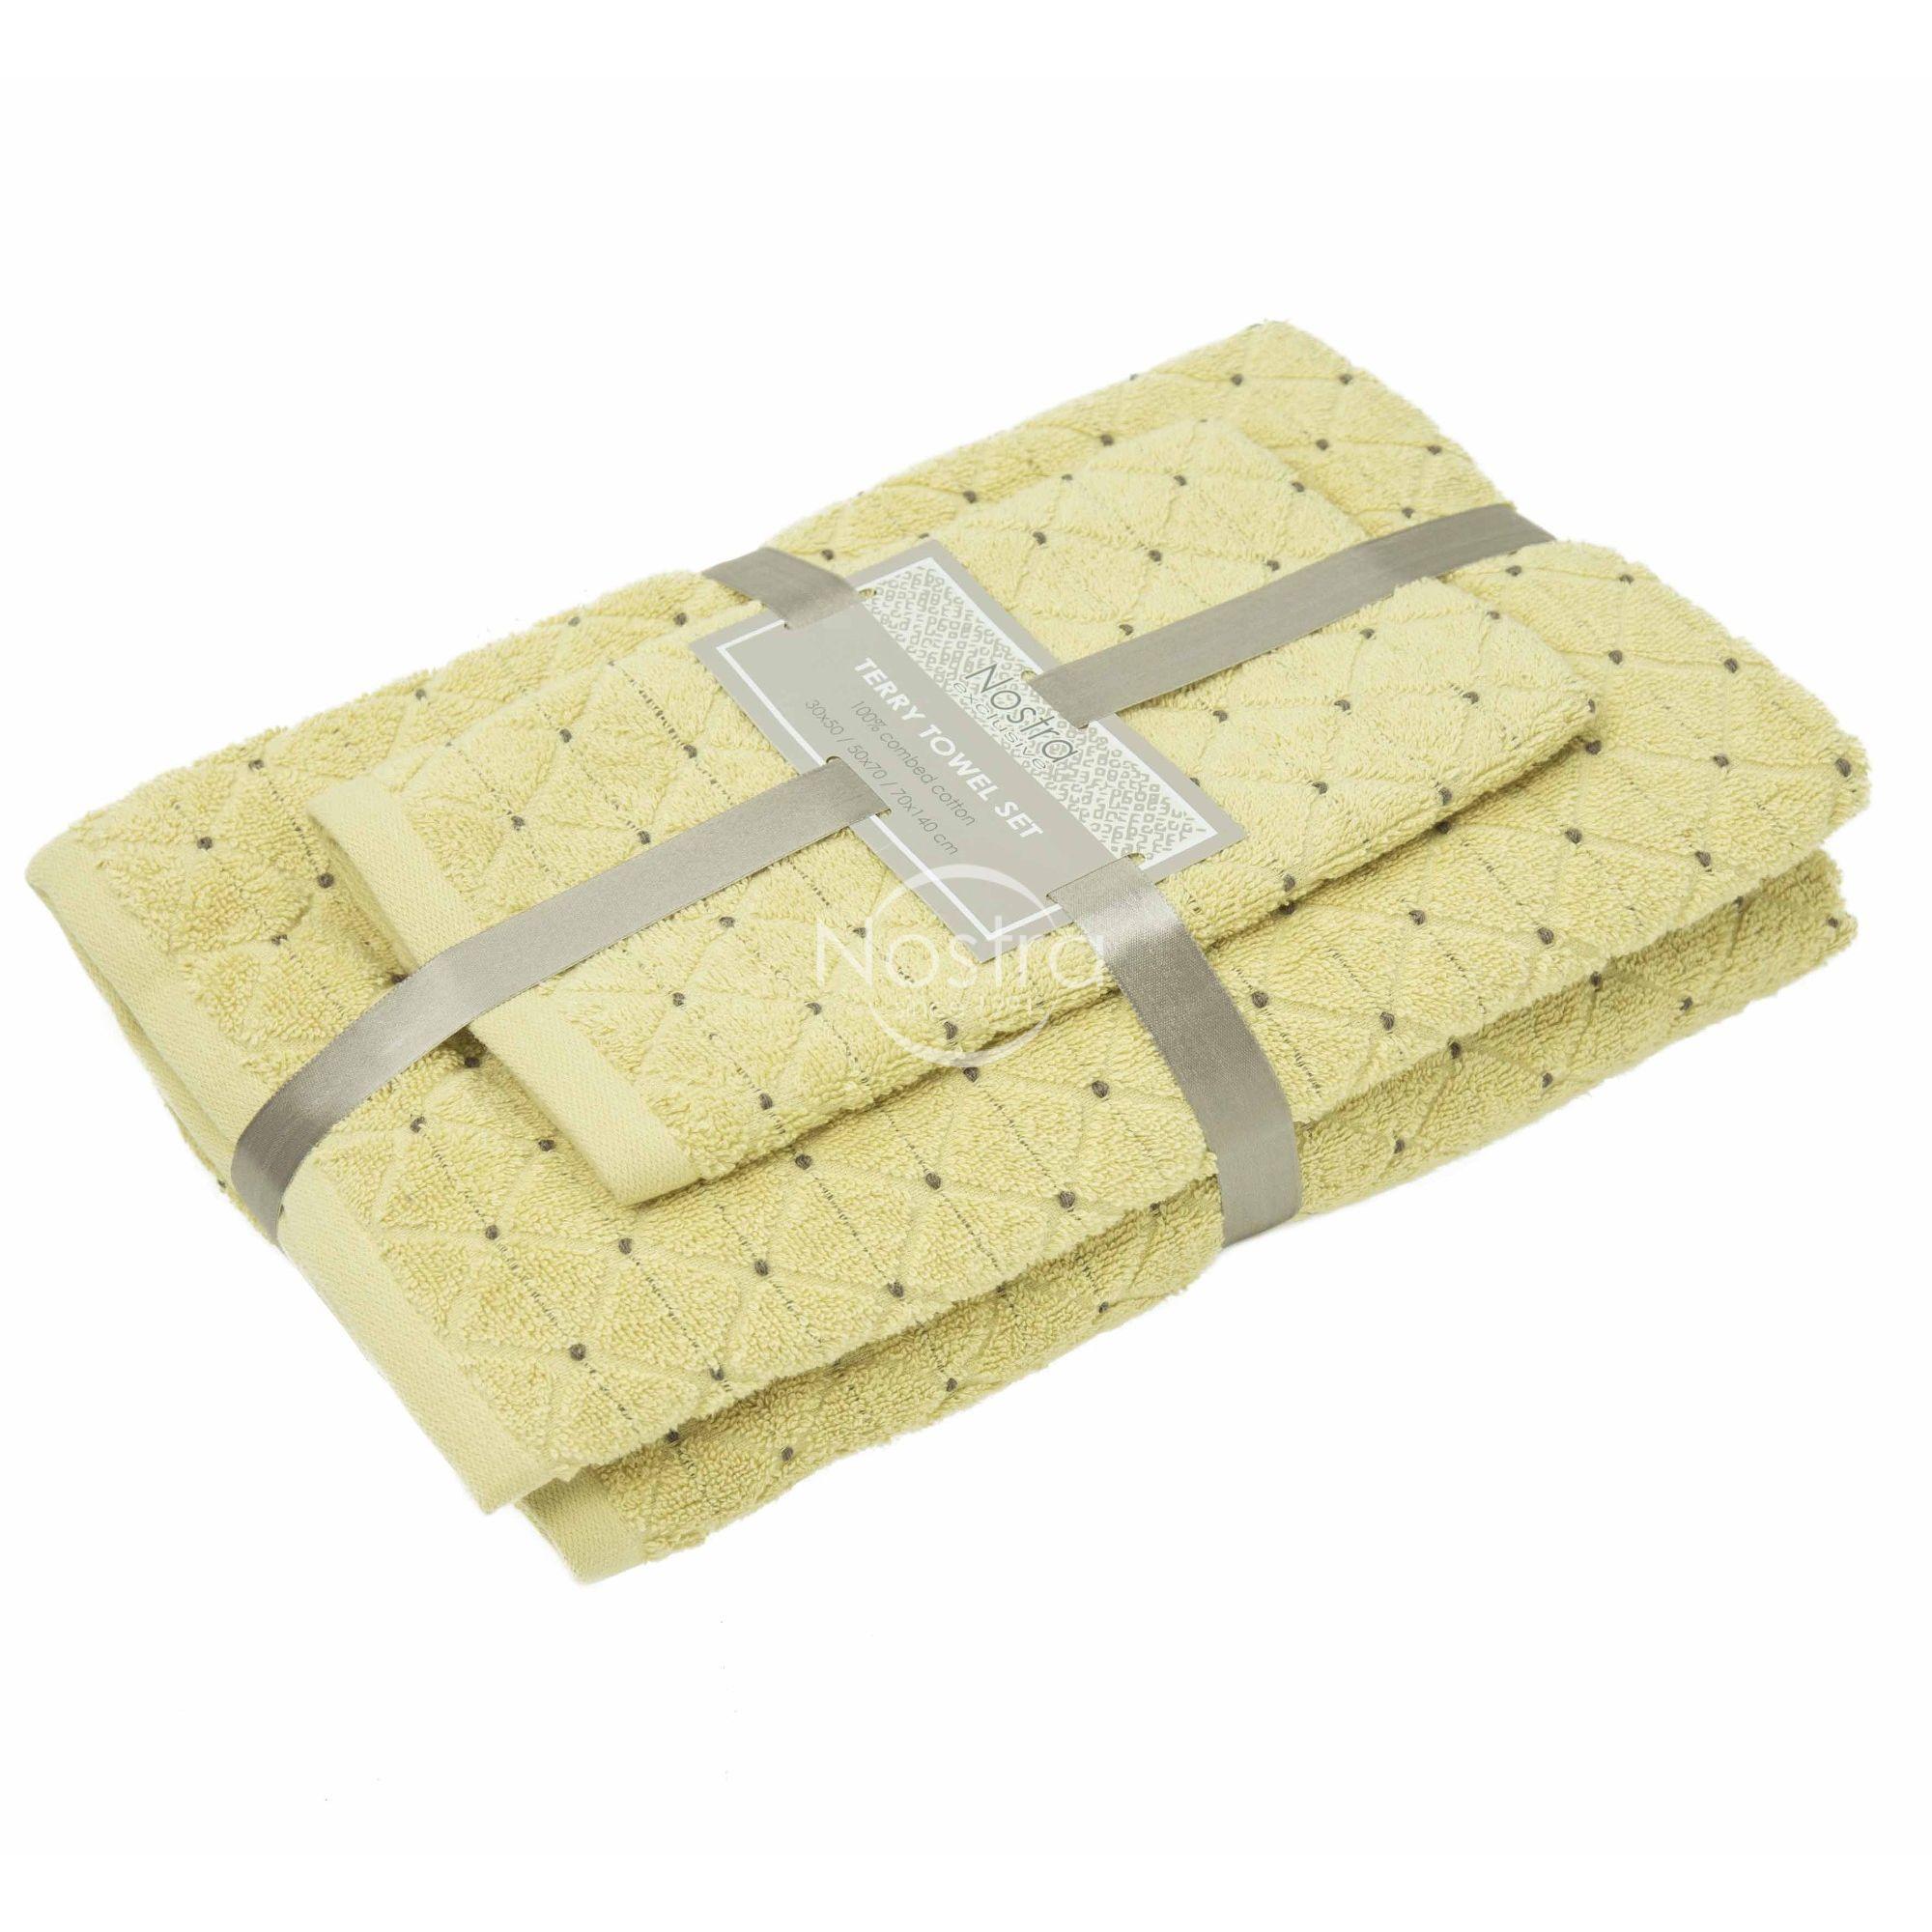 3 dalių rankšluosčių komplektas T0107 T0107-DUSTY YELLOW 30x50, 50x70, 70x140 cm